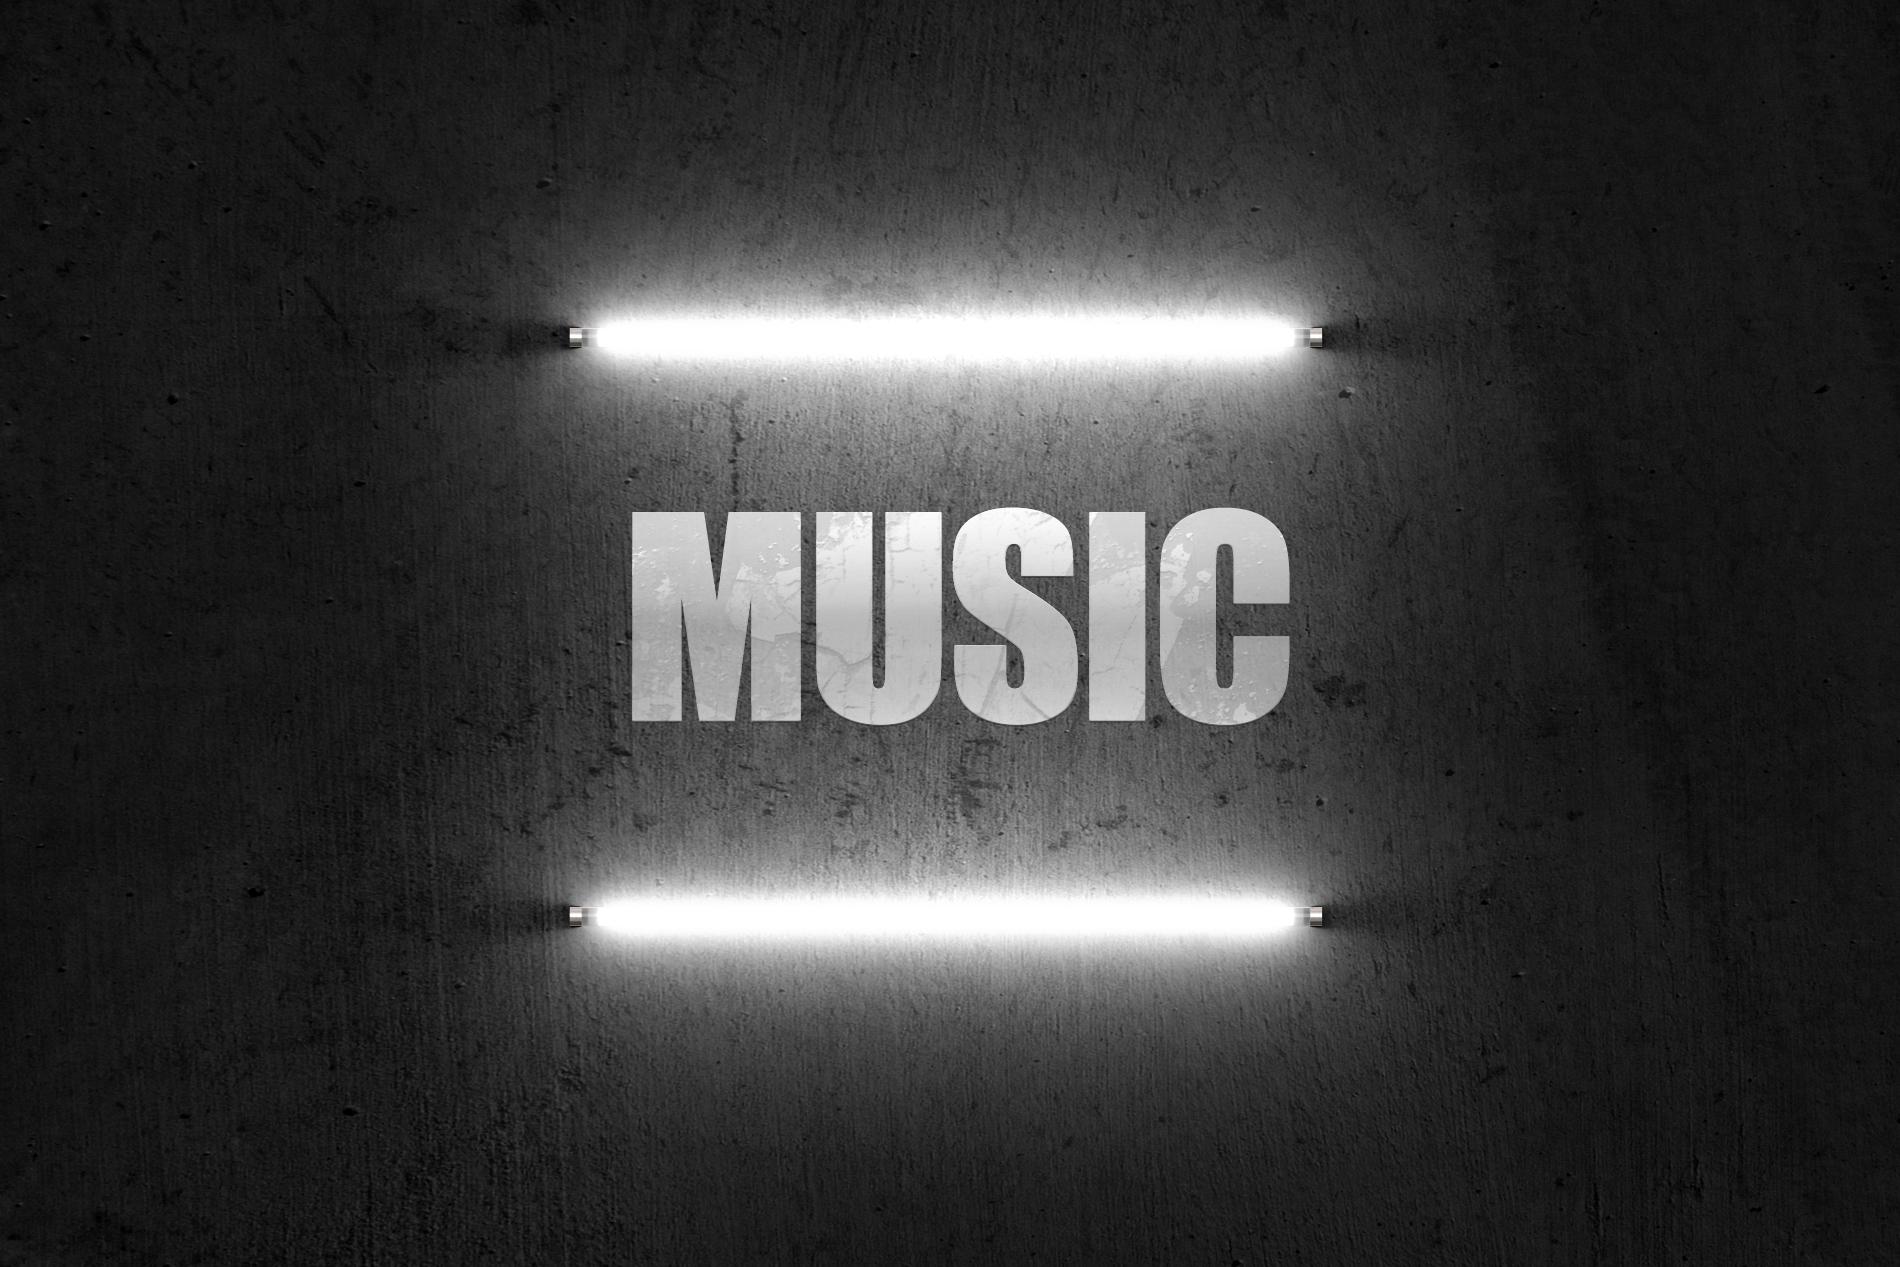 https://shaqfuradio.com/wp-content/uploads/2019/08/SHAQ-FU-MUSIC.jpg